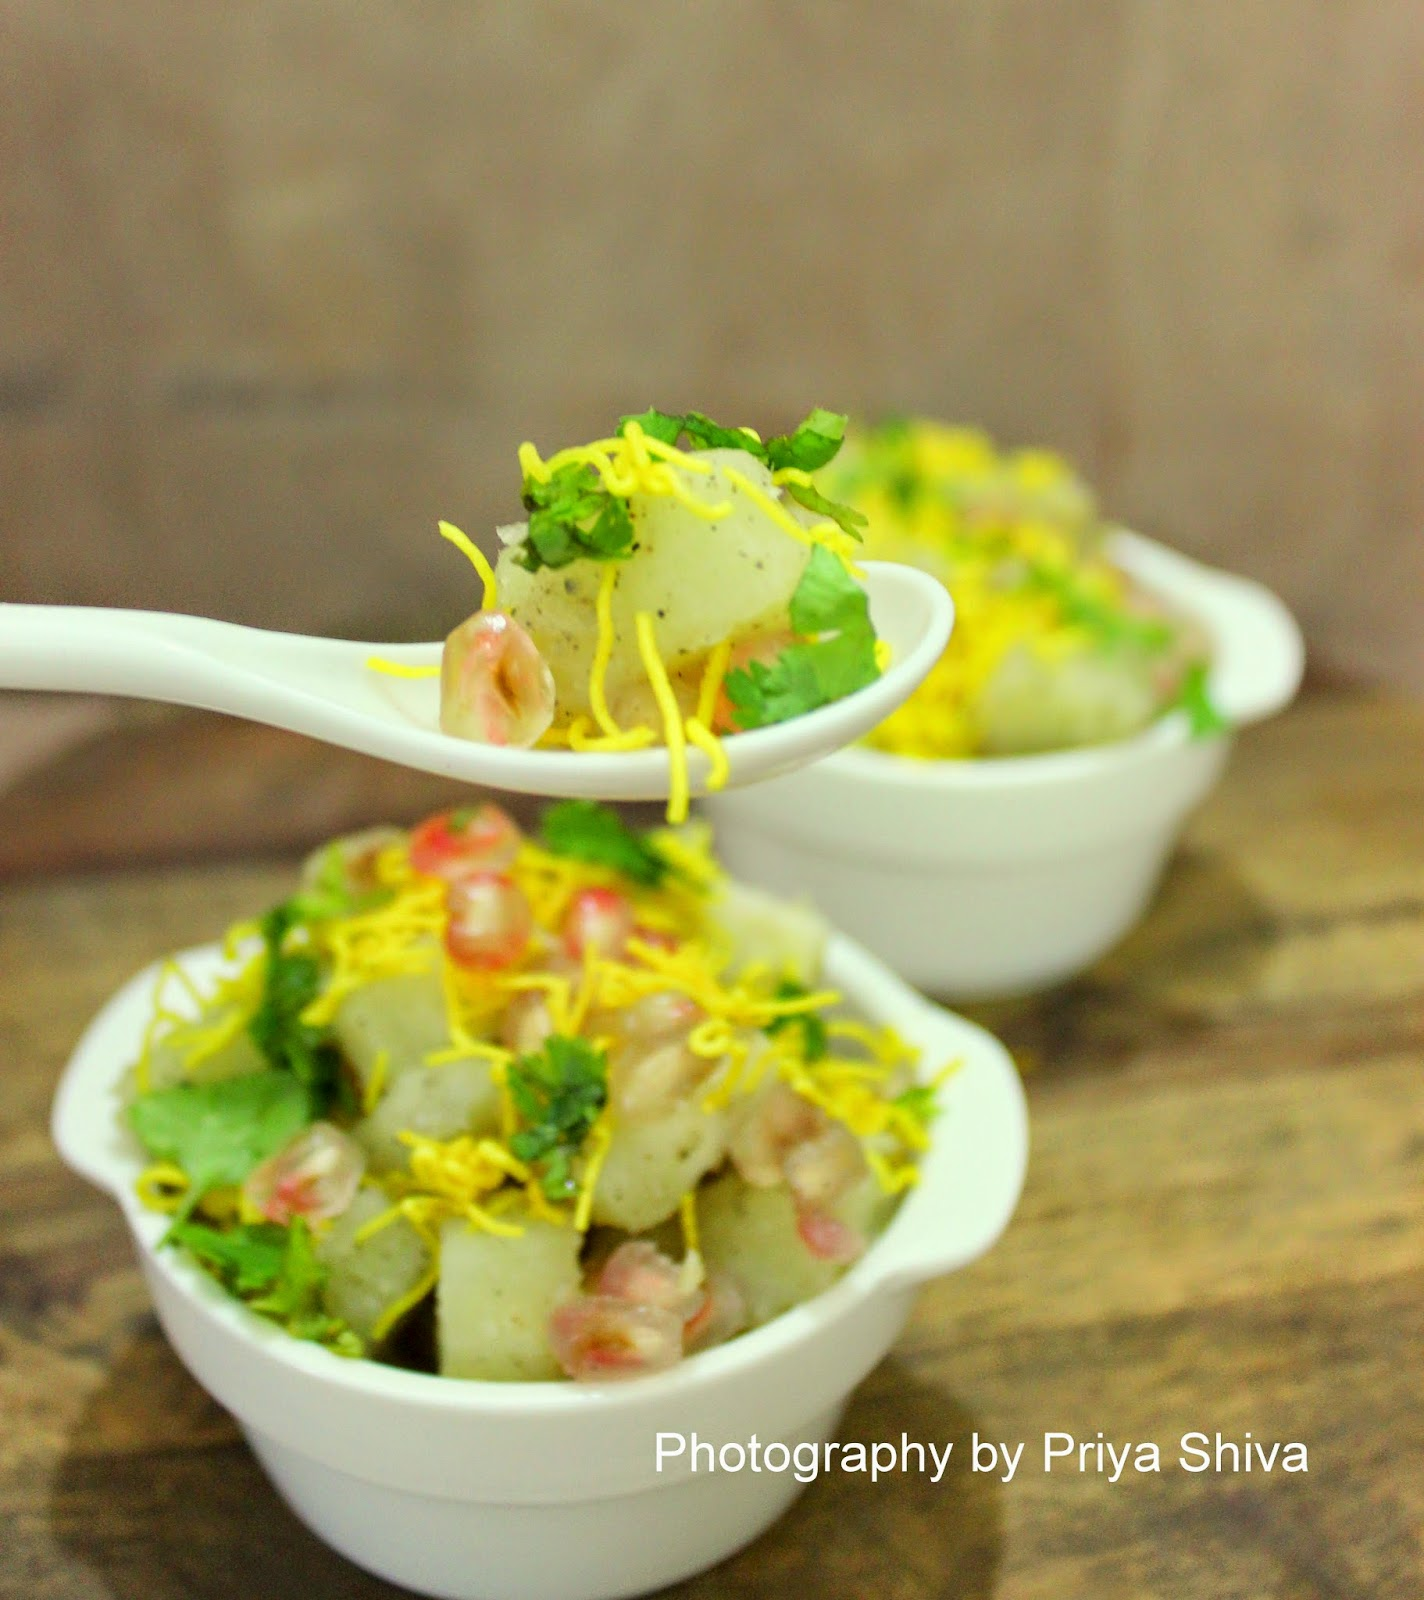 recipe, appetizer, snack, starter, street food